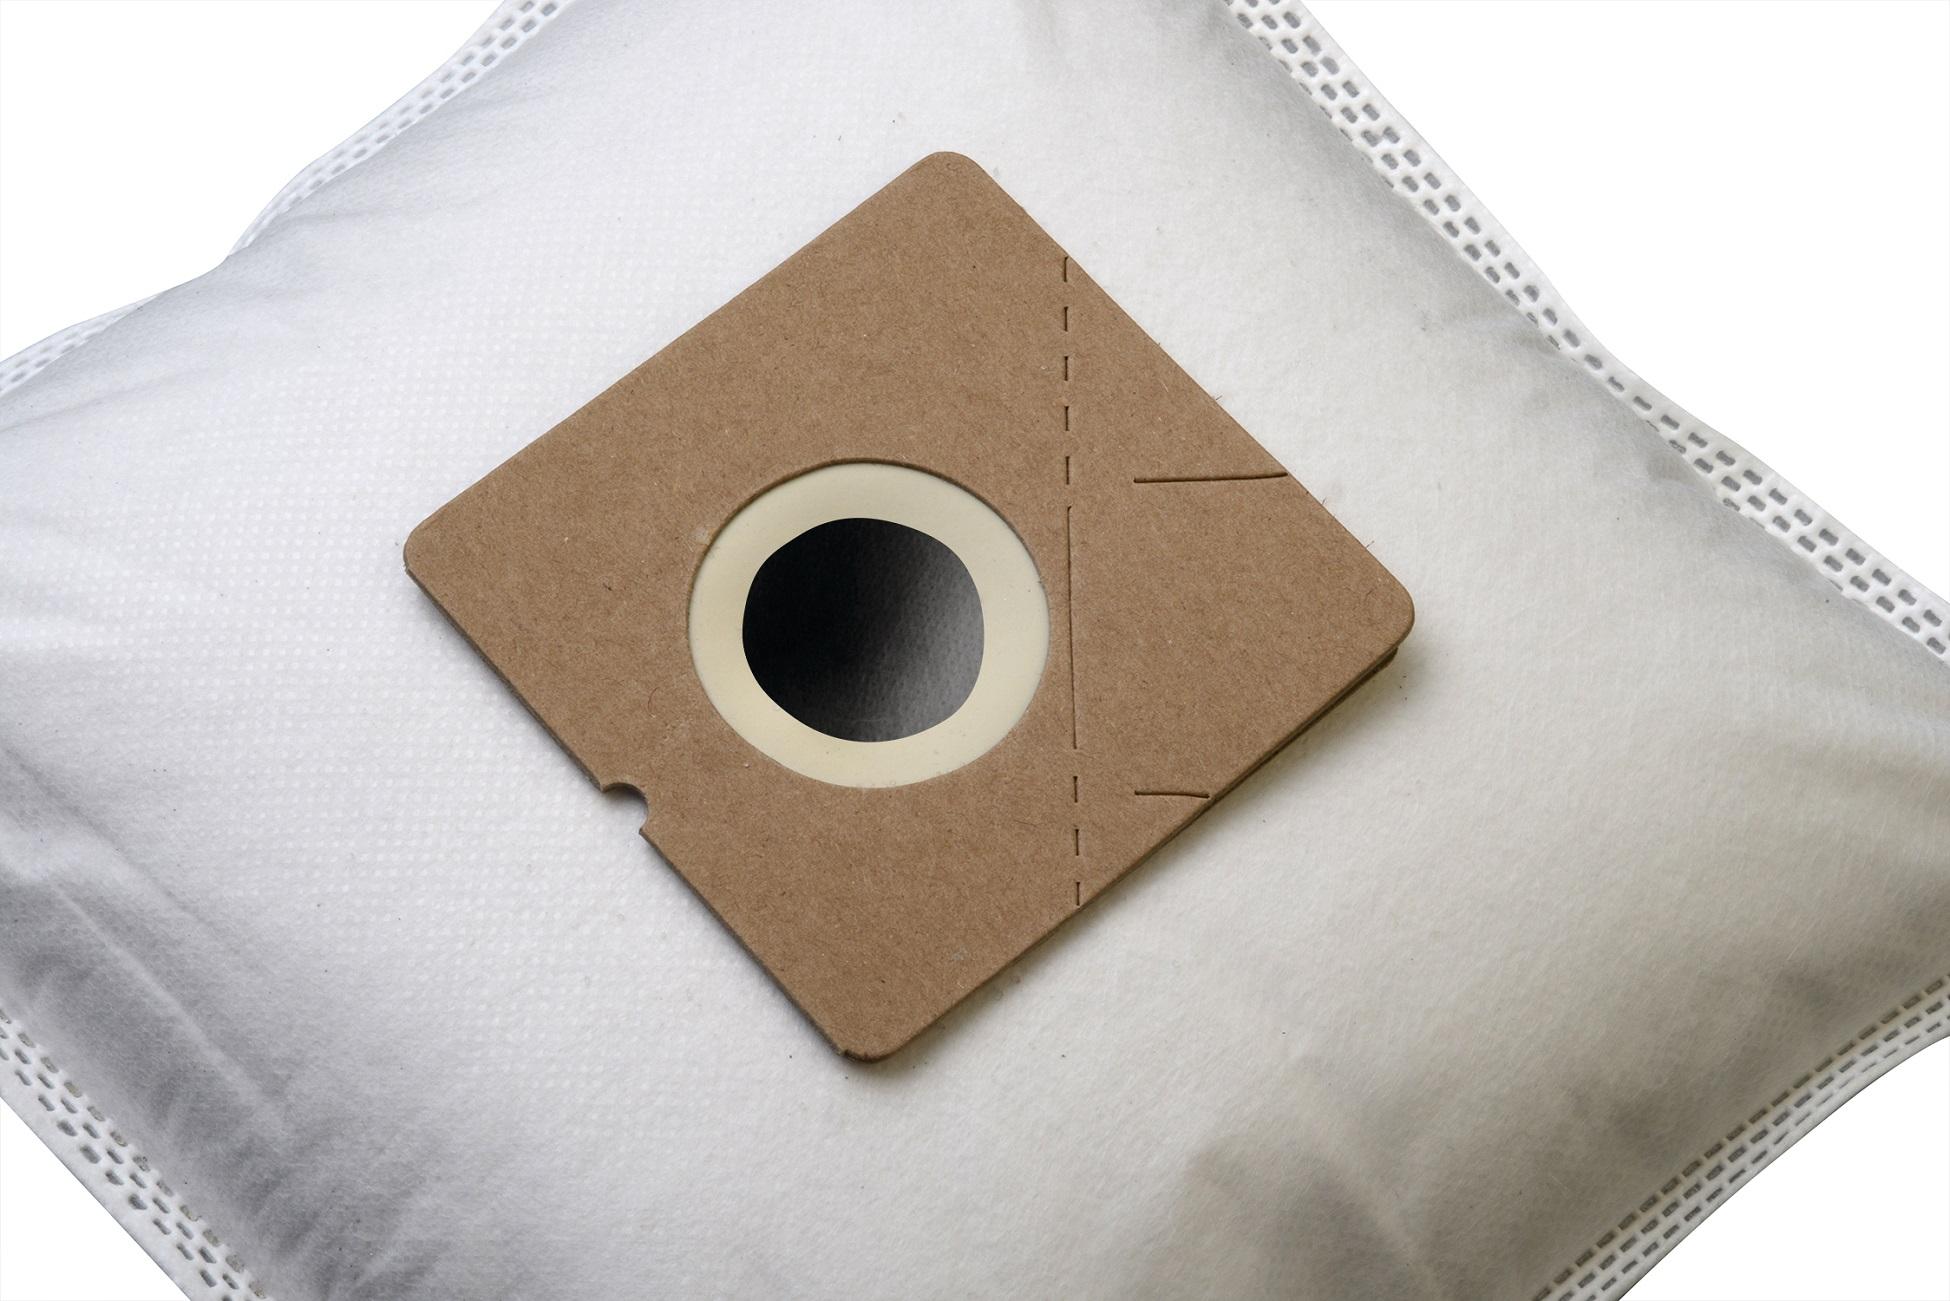 KOMA sáčky ETA Domino 1419 textilní, 5ks+mikrofiltr